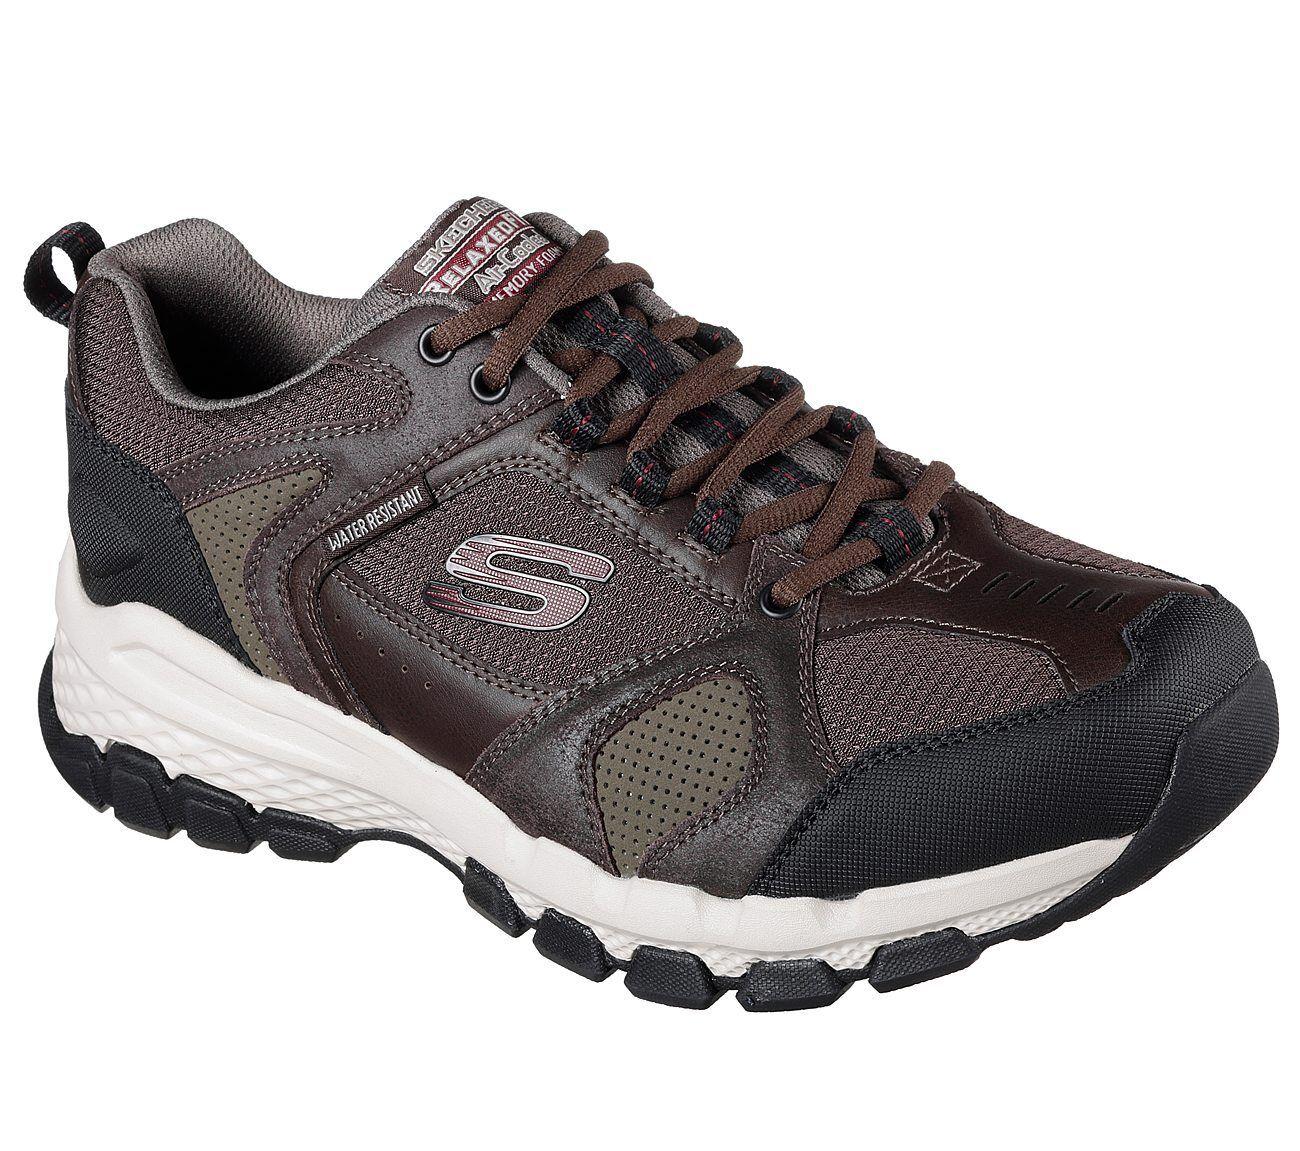 51586 EWW Brown Extra Wide Fit Skechers shoes Men Memory Foam Sport Trail Hiking